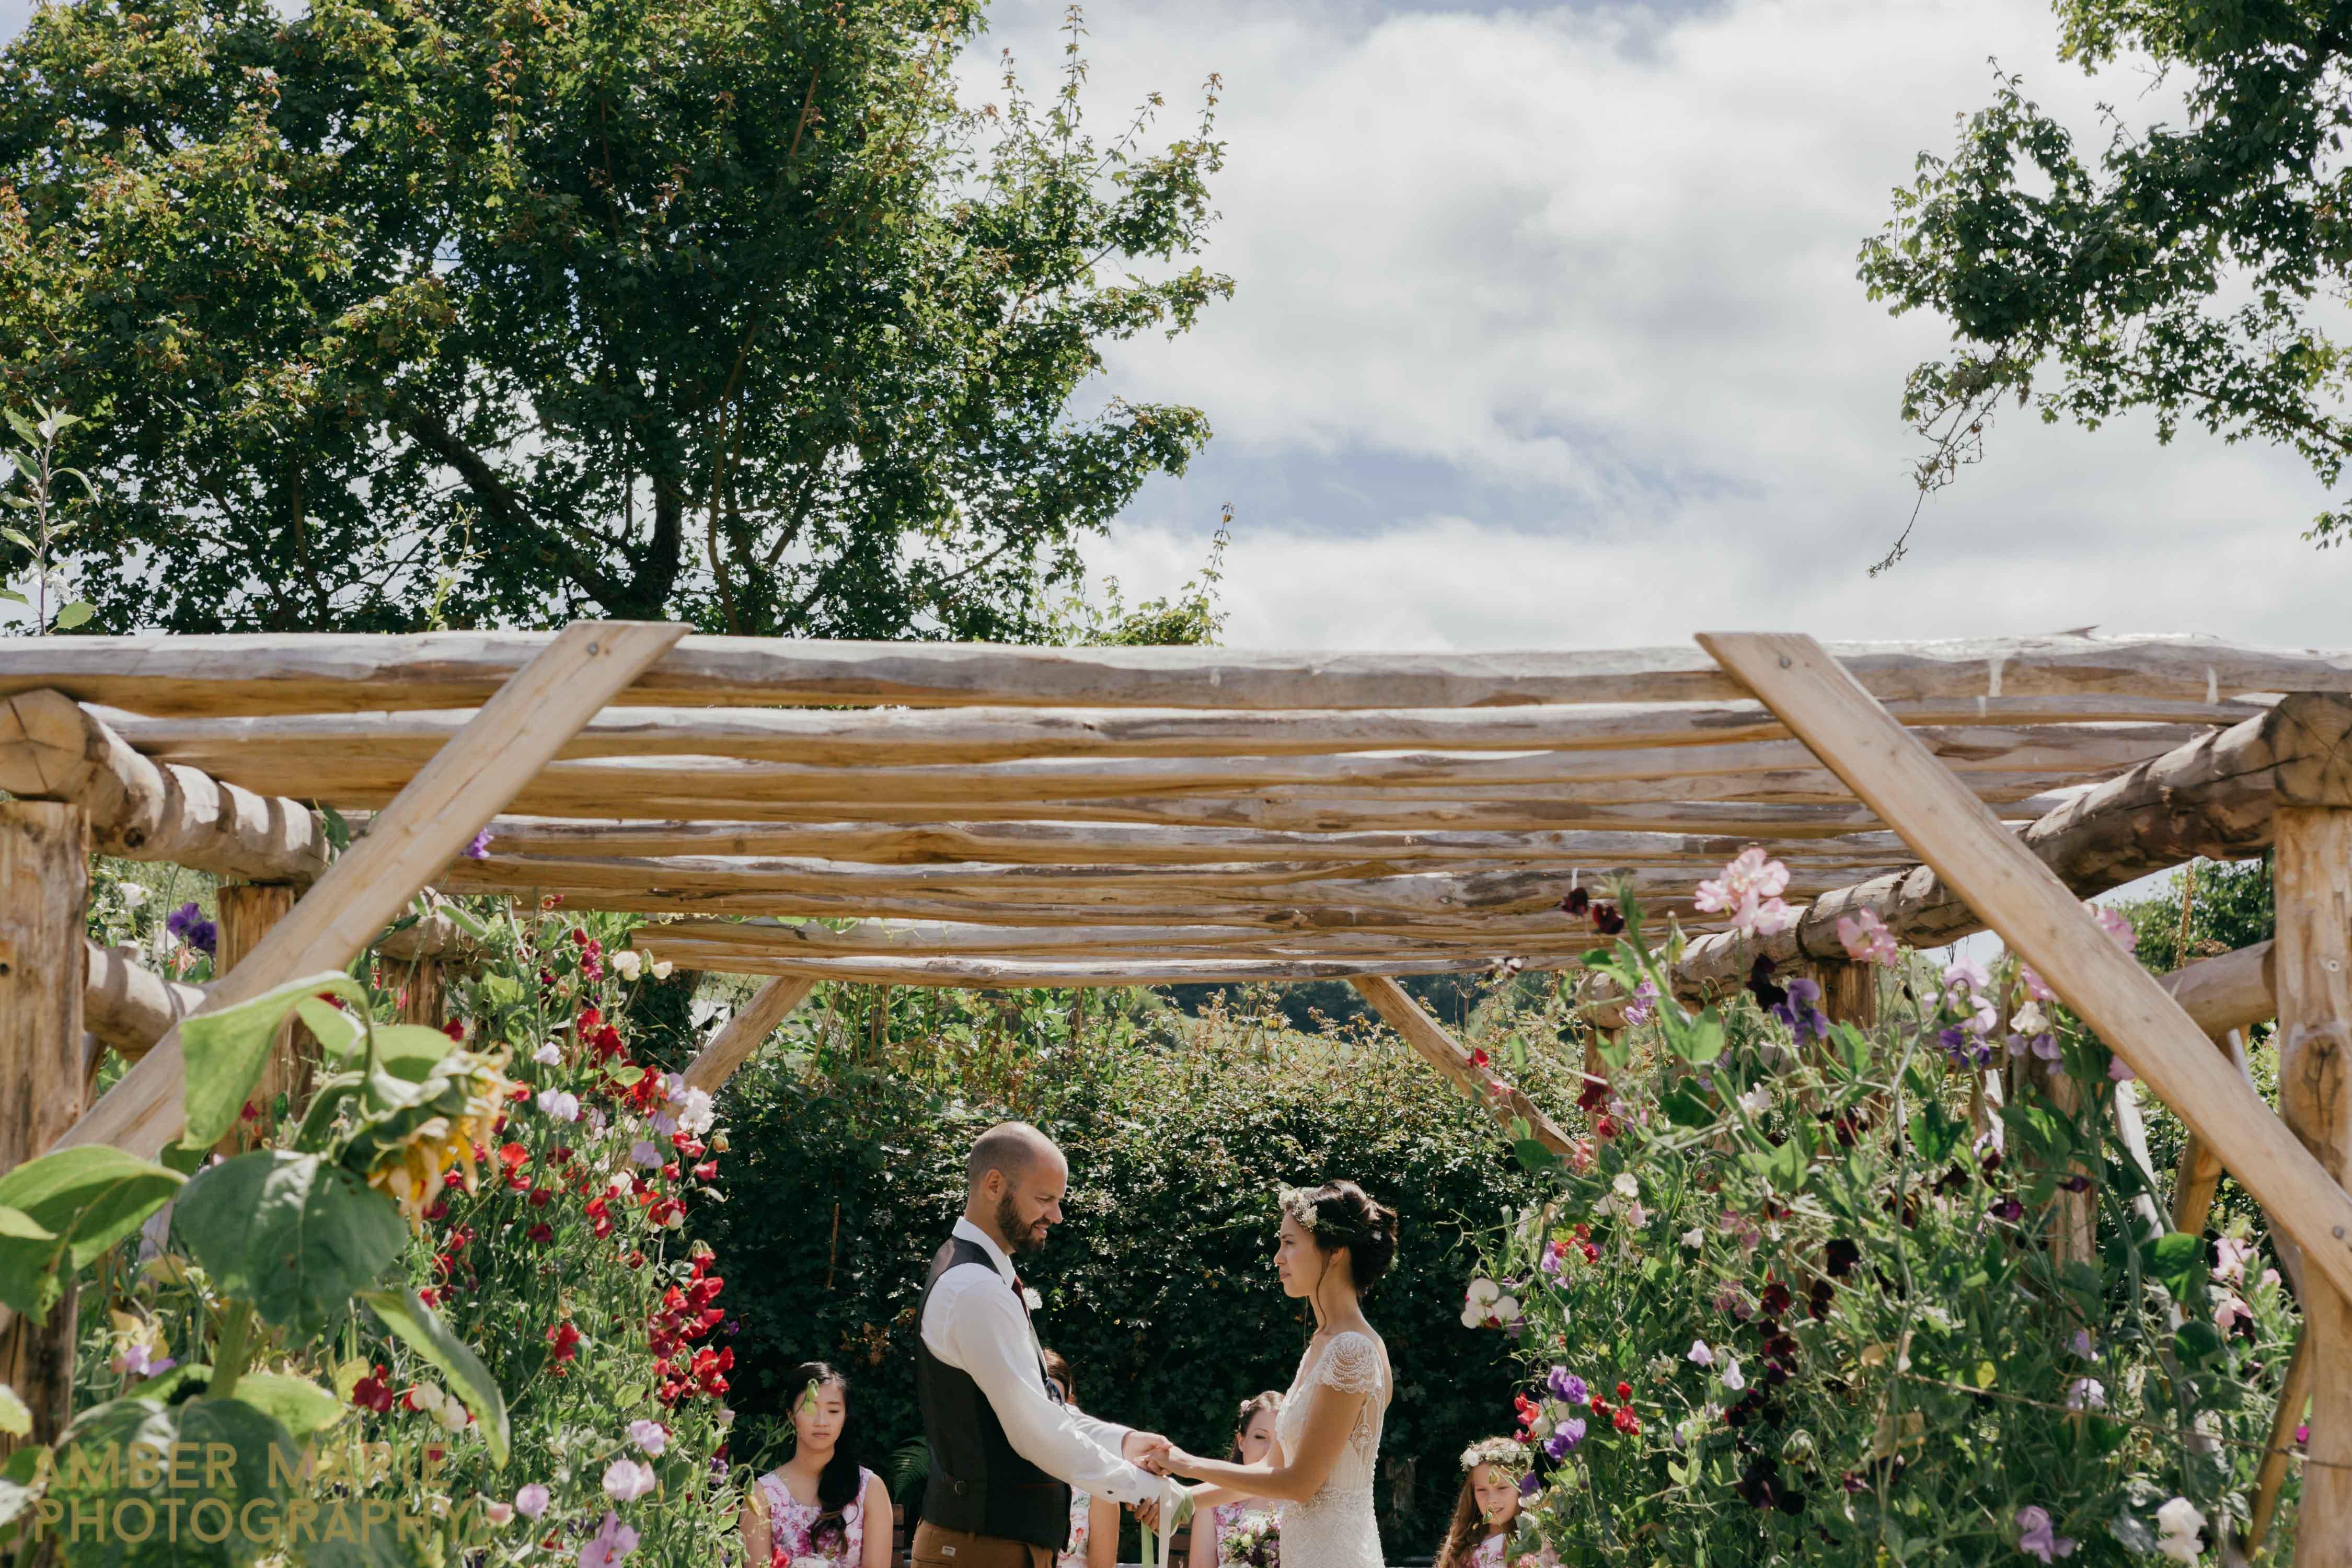 Eco friendly wedding photographers creative wedding photographers leeds yorkshire